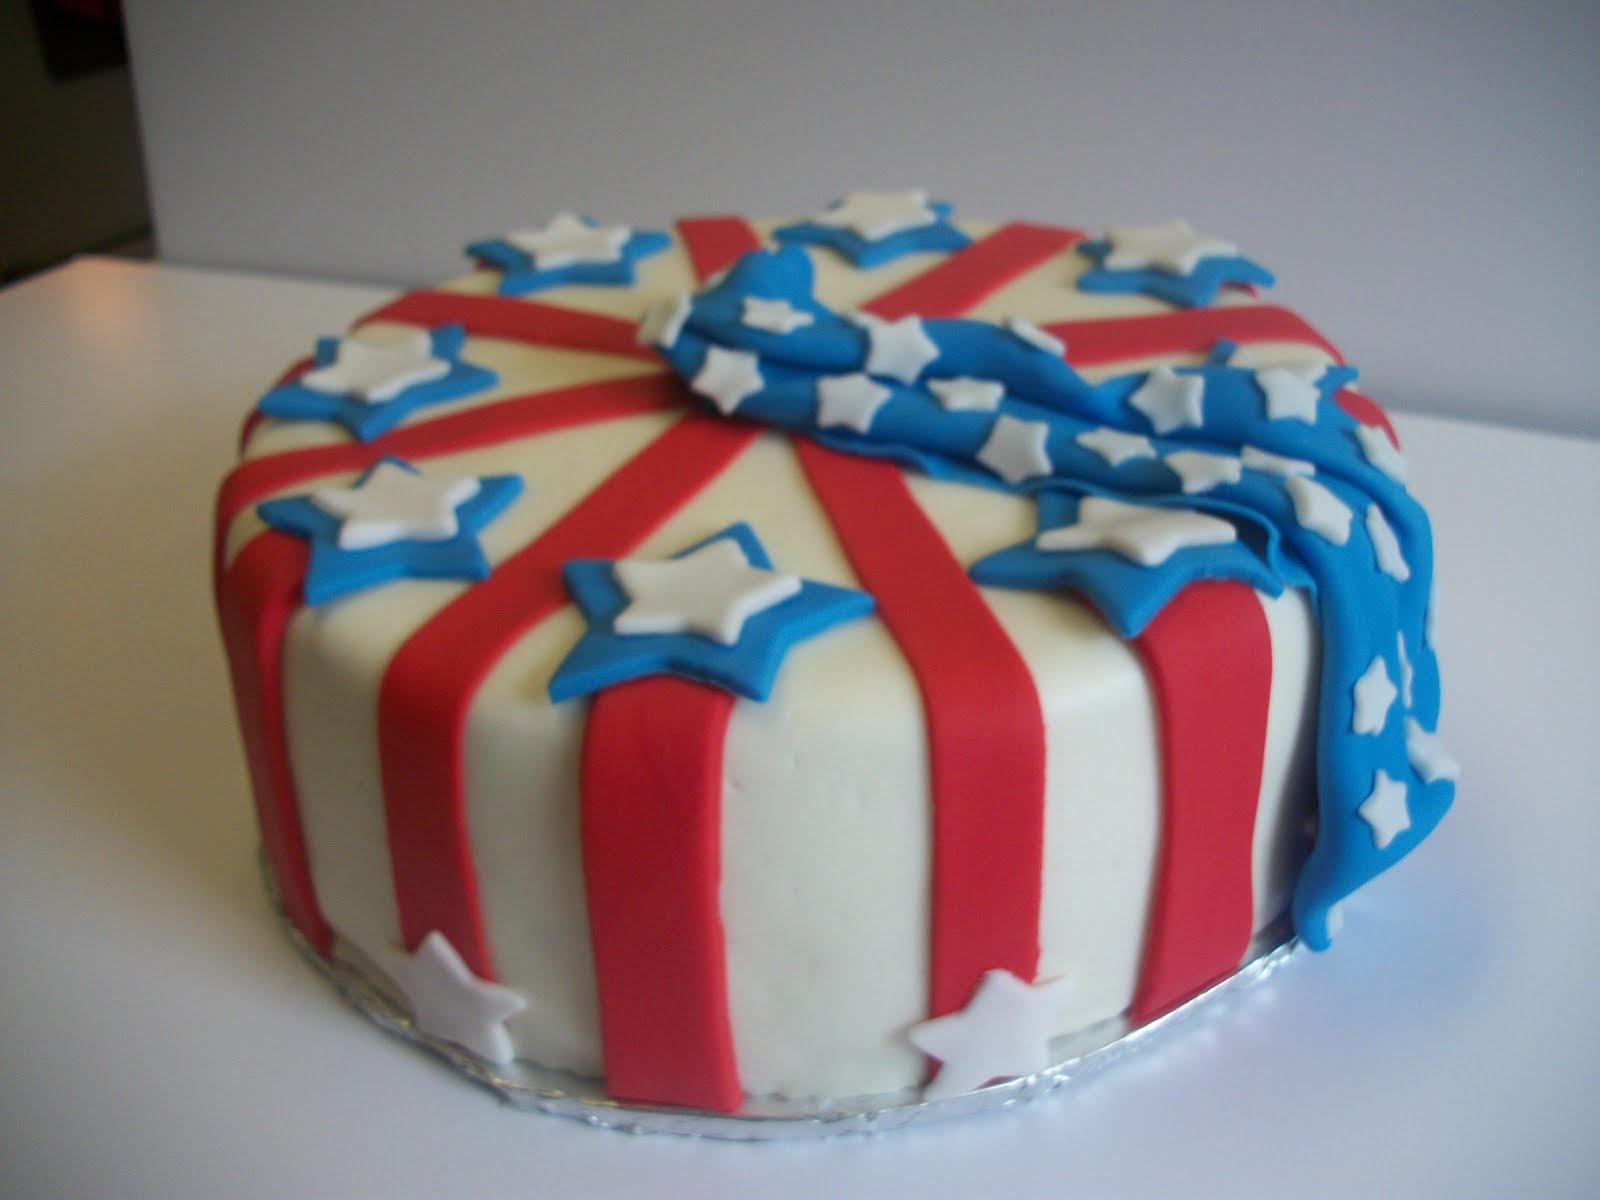 Cake Decoration Day : Tasty Cakes: Memorial Day Cake